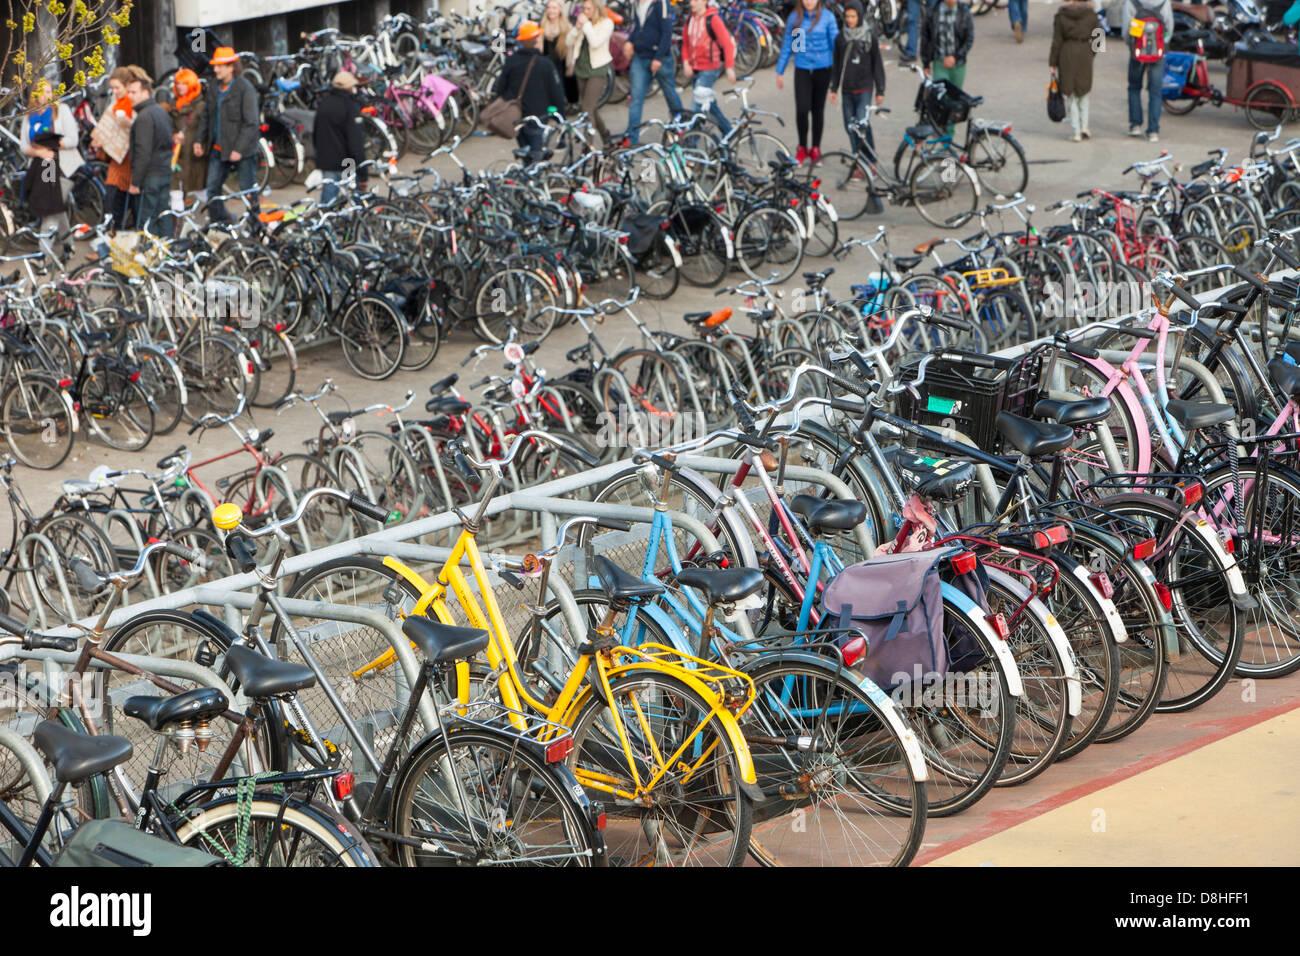 Bikes In Bike Racks In Amsterdam Netherlands A Huge